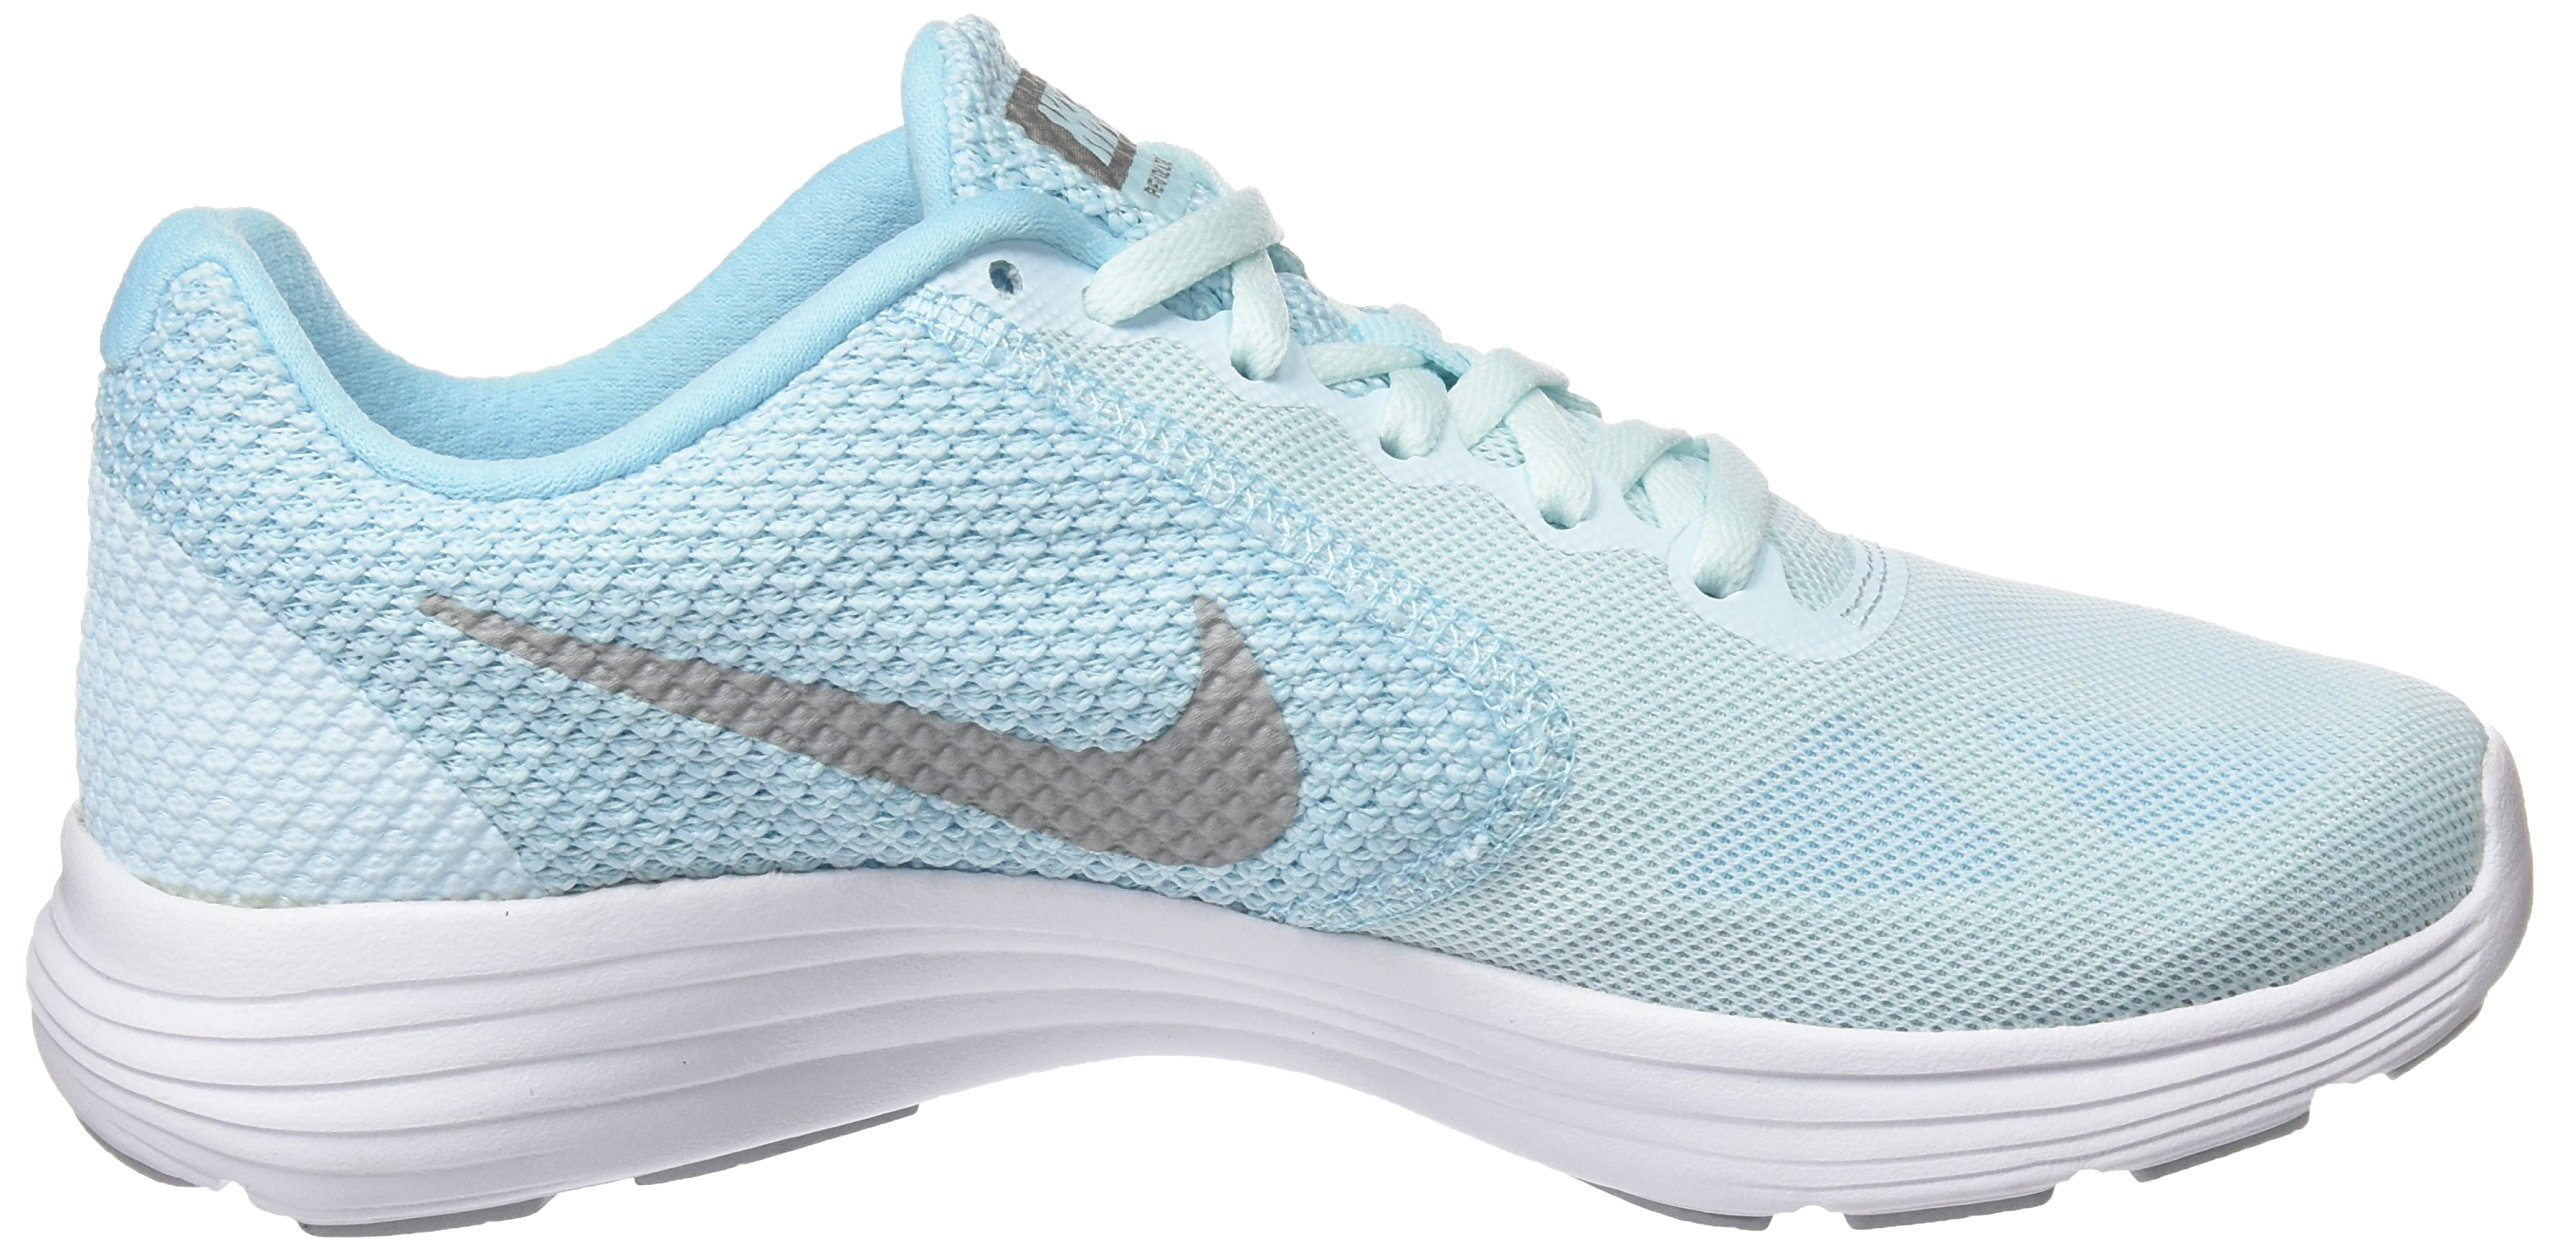 NIKE Women's Revolution 3 Running Shoe, Glacier Blue Silver Still Blue, US Women's